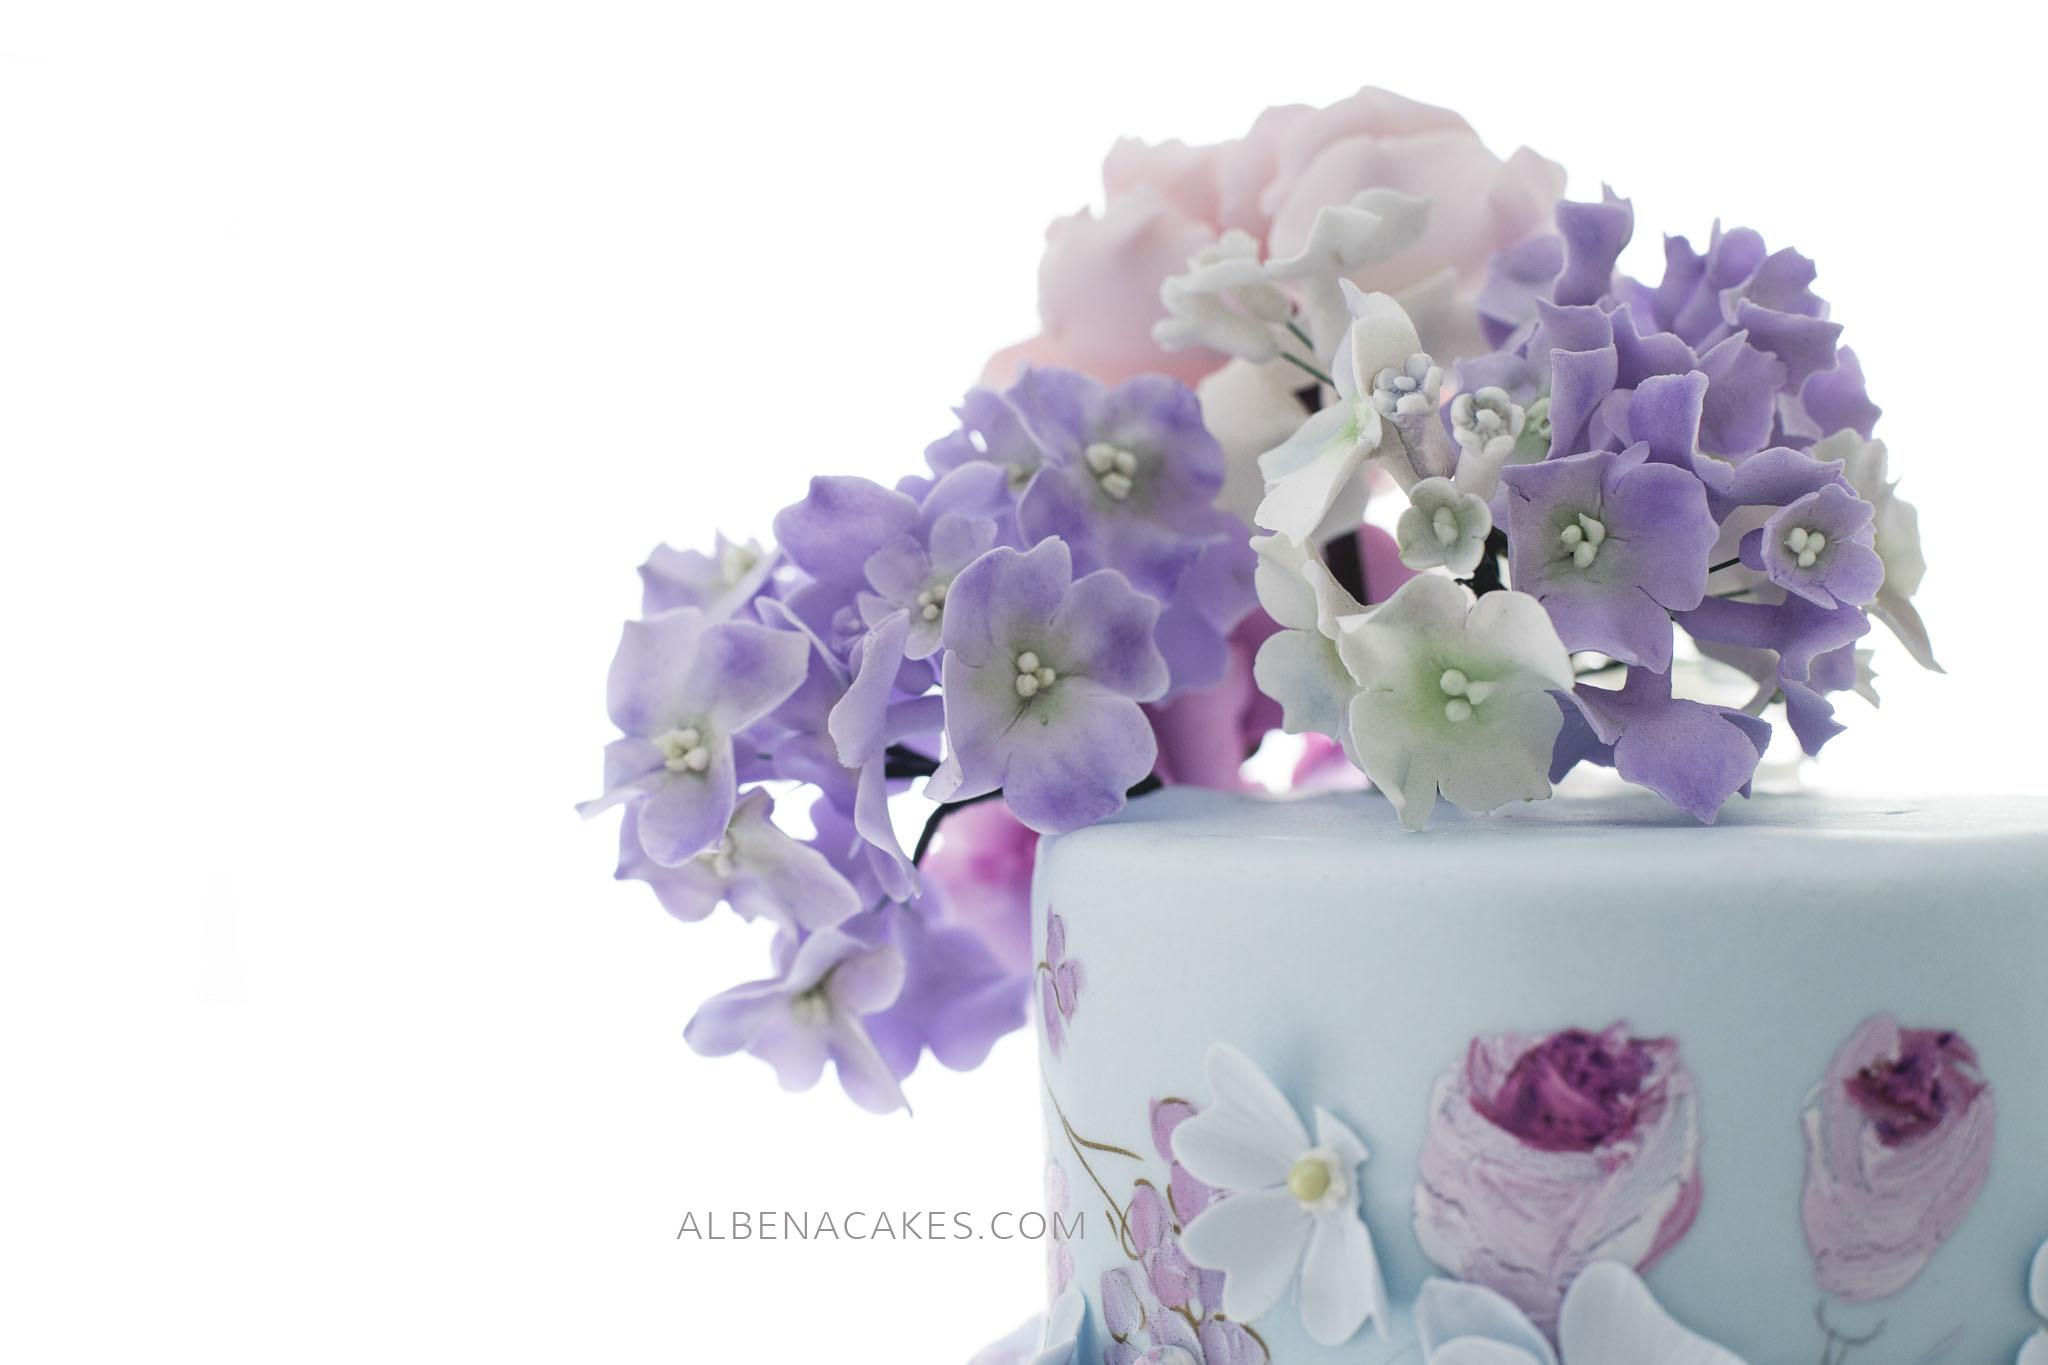 уникалните рисувани торти на Албена Петрова